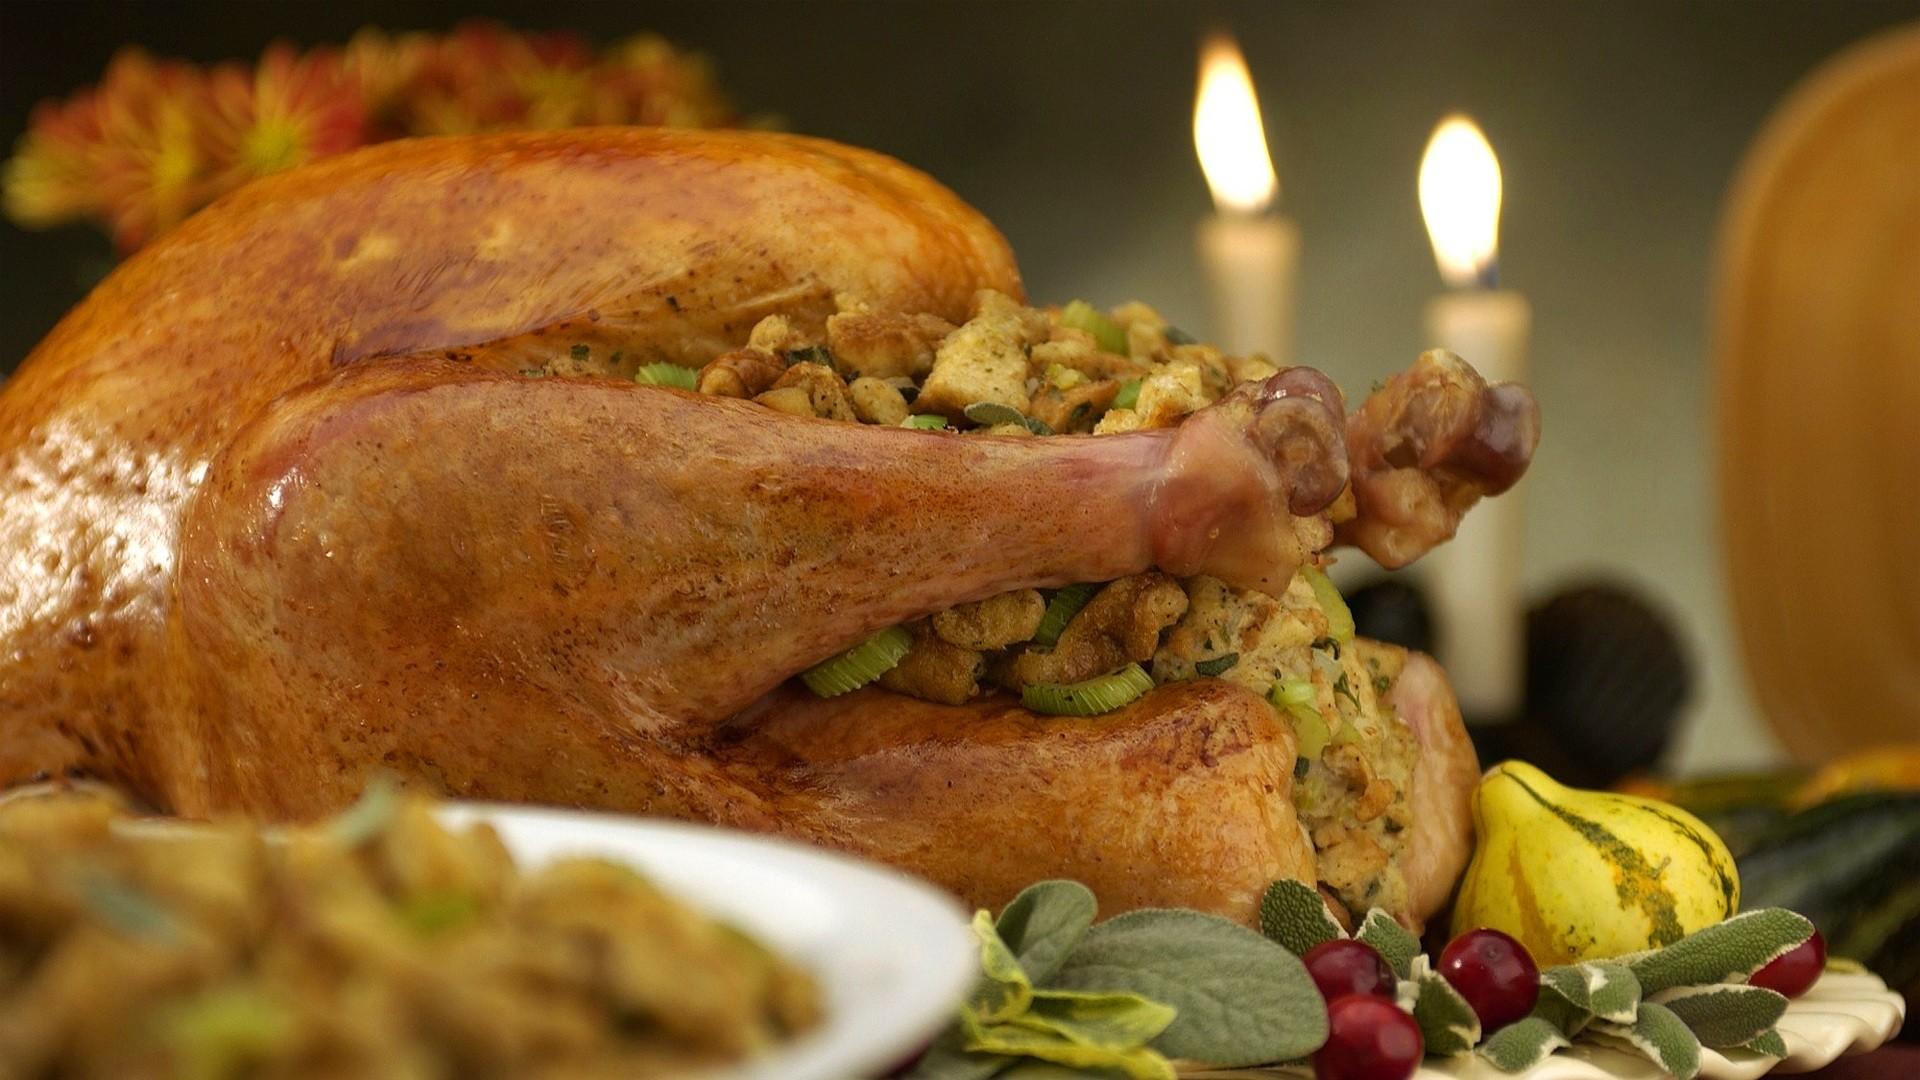 Food Turkey meat thanksgiving candles fire wallpaper     58940    WallpaperUP